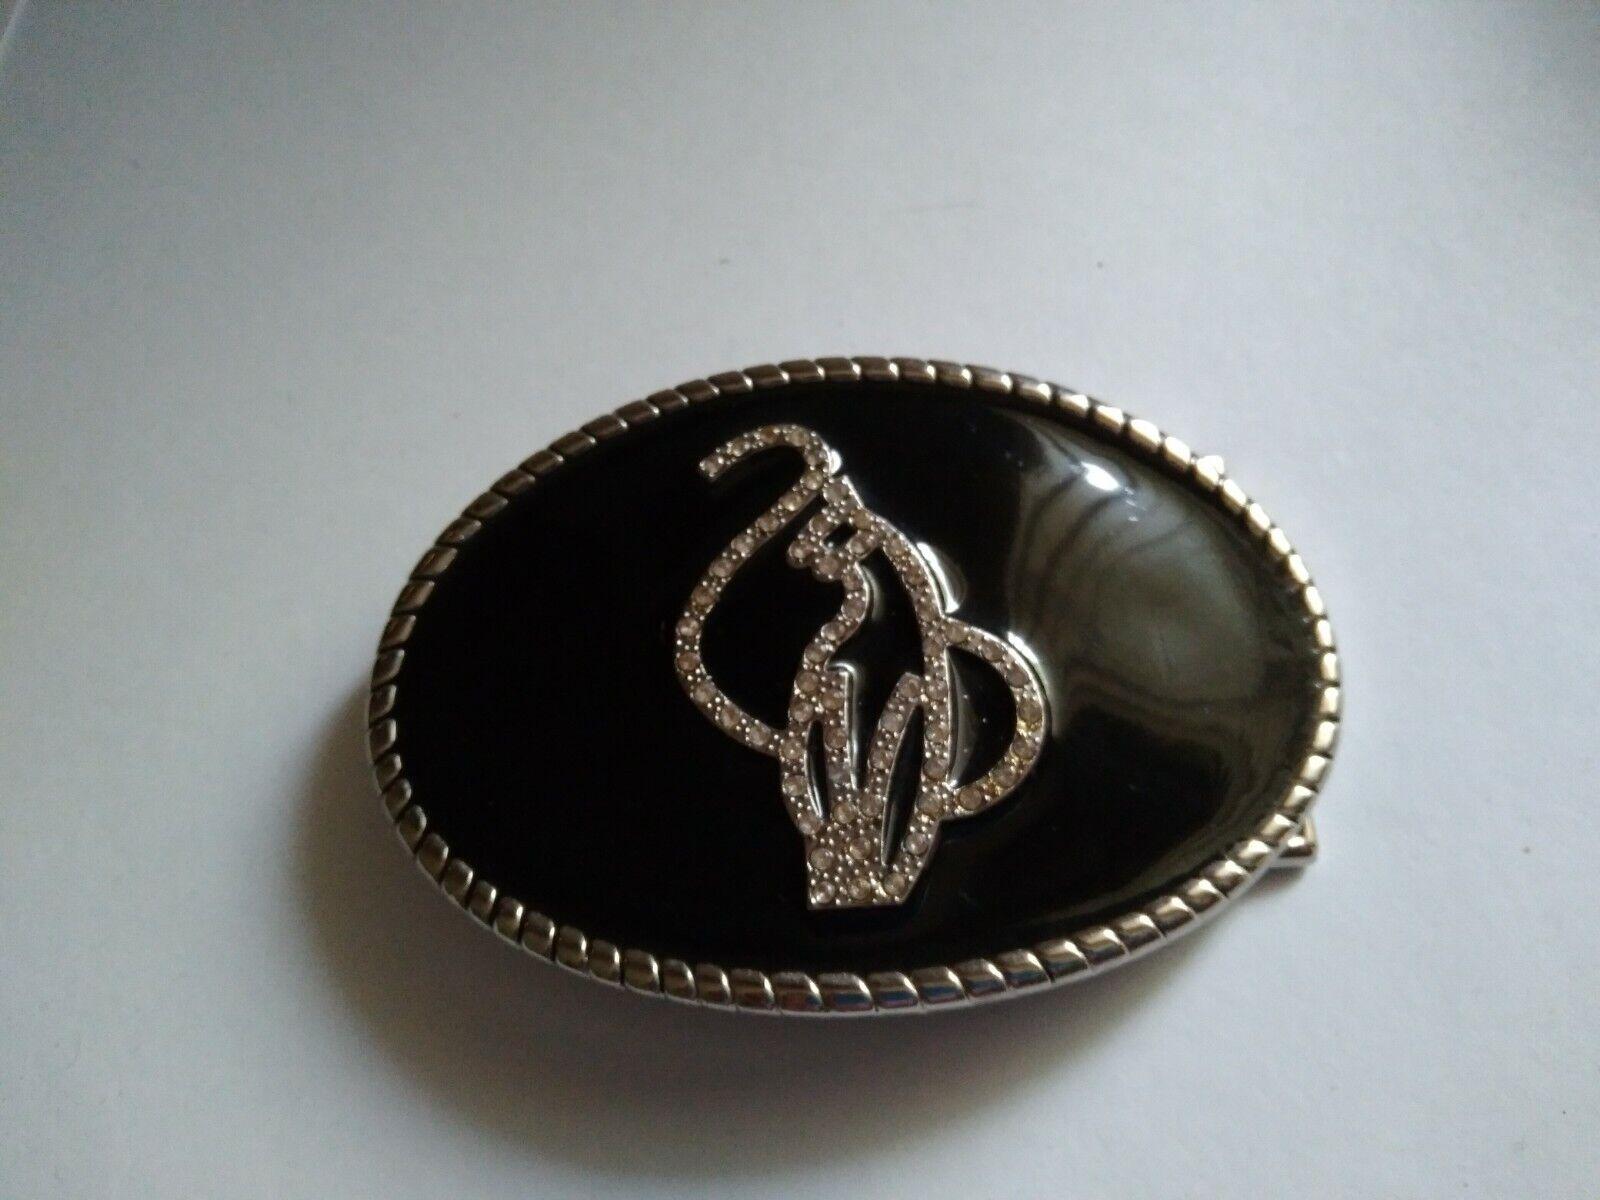 Baby Phat Siamese Cat Logo Rhinestone Black enamel Belt Buckle Bling